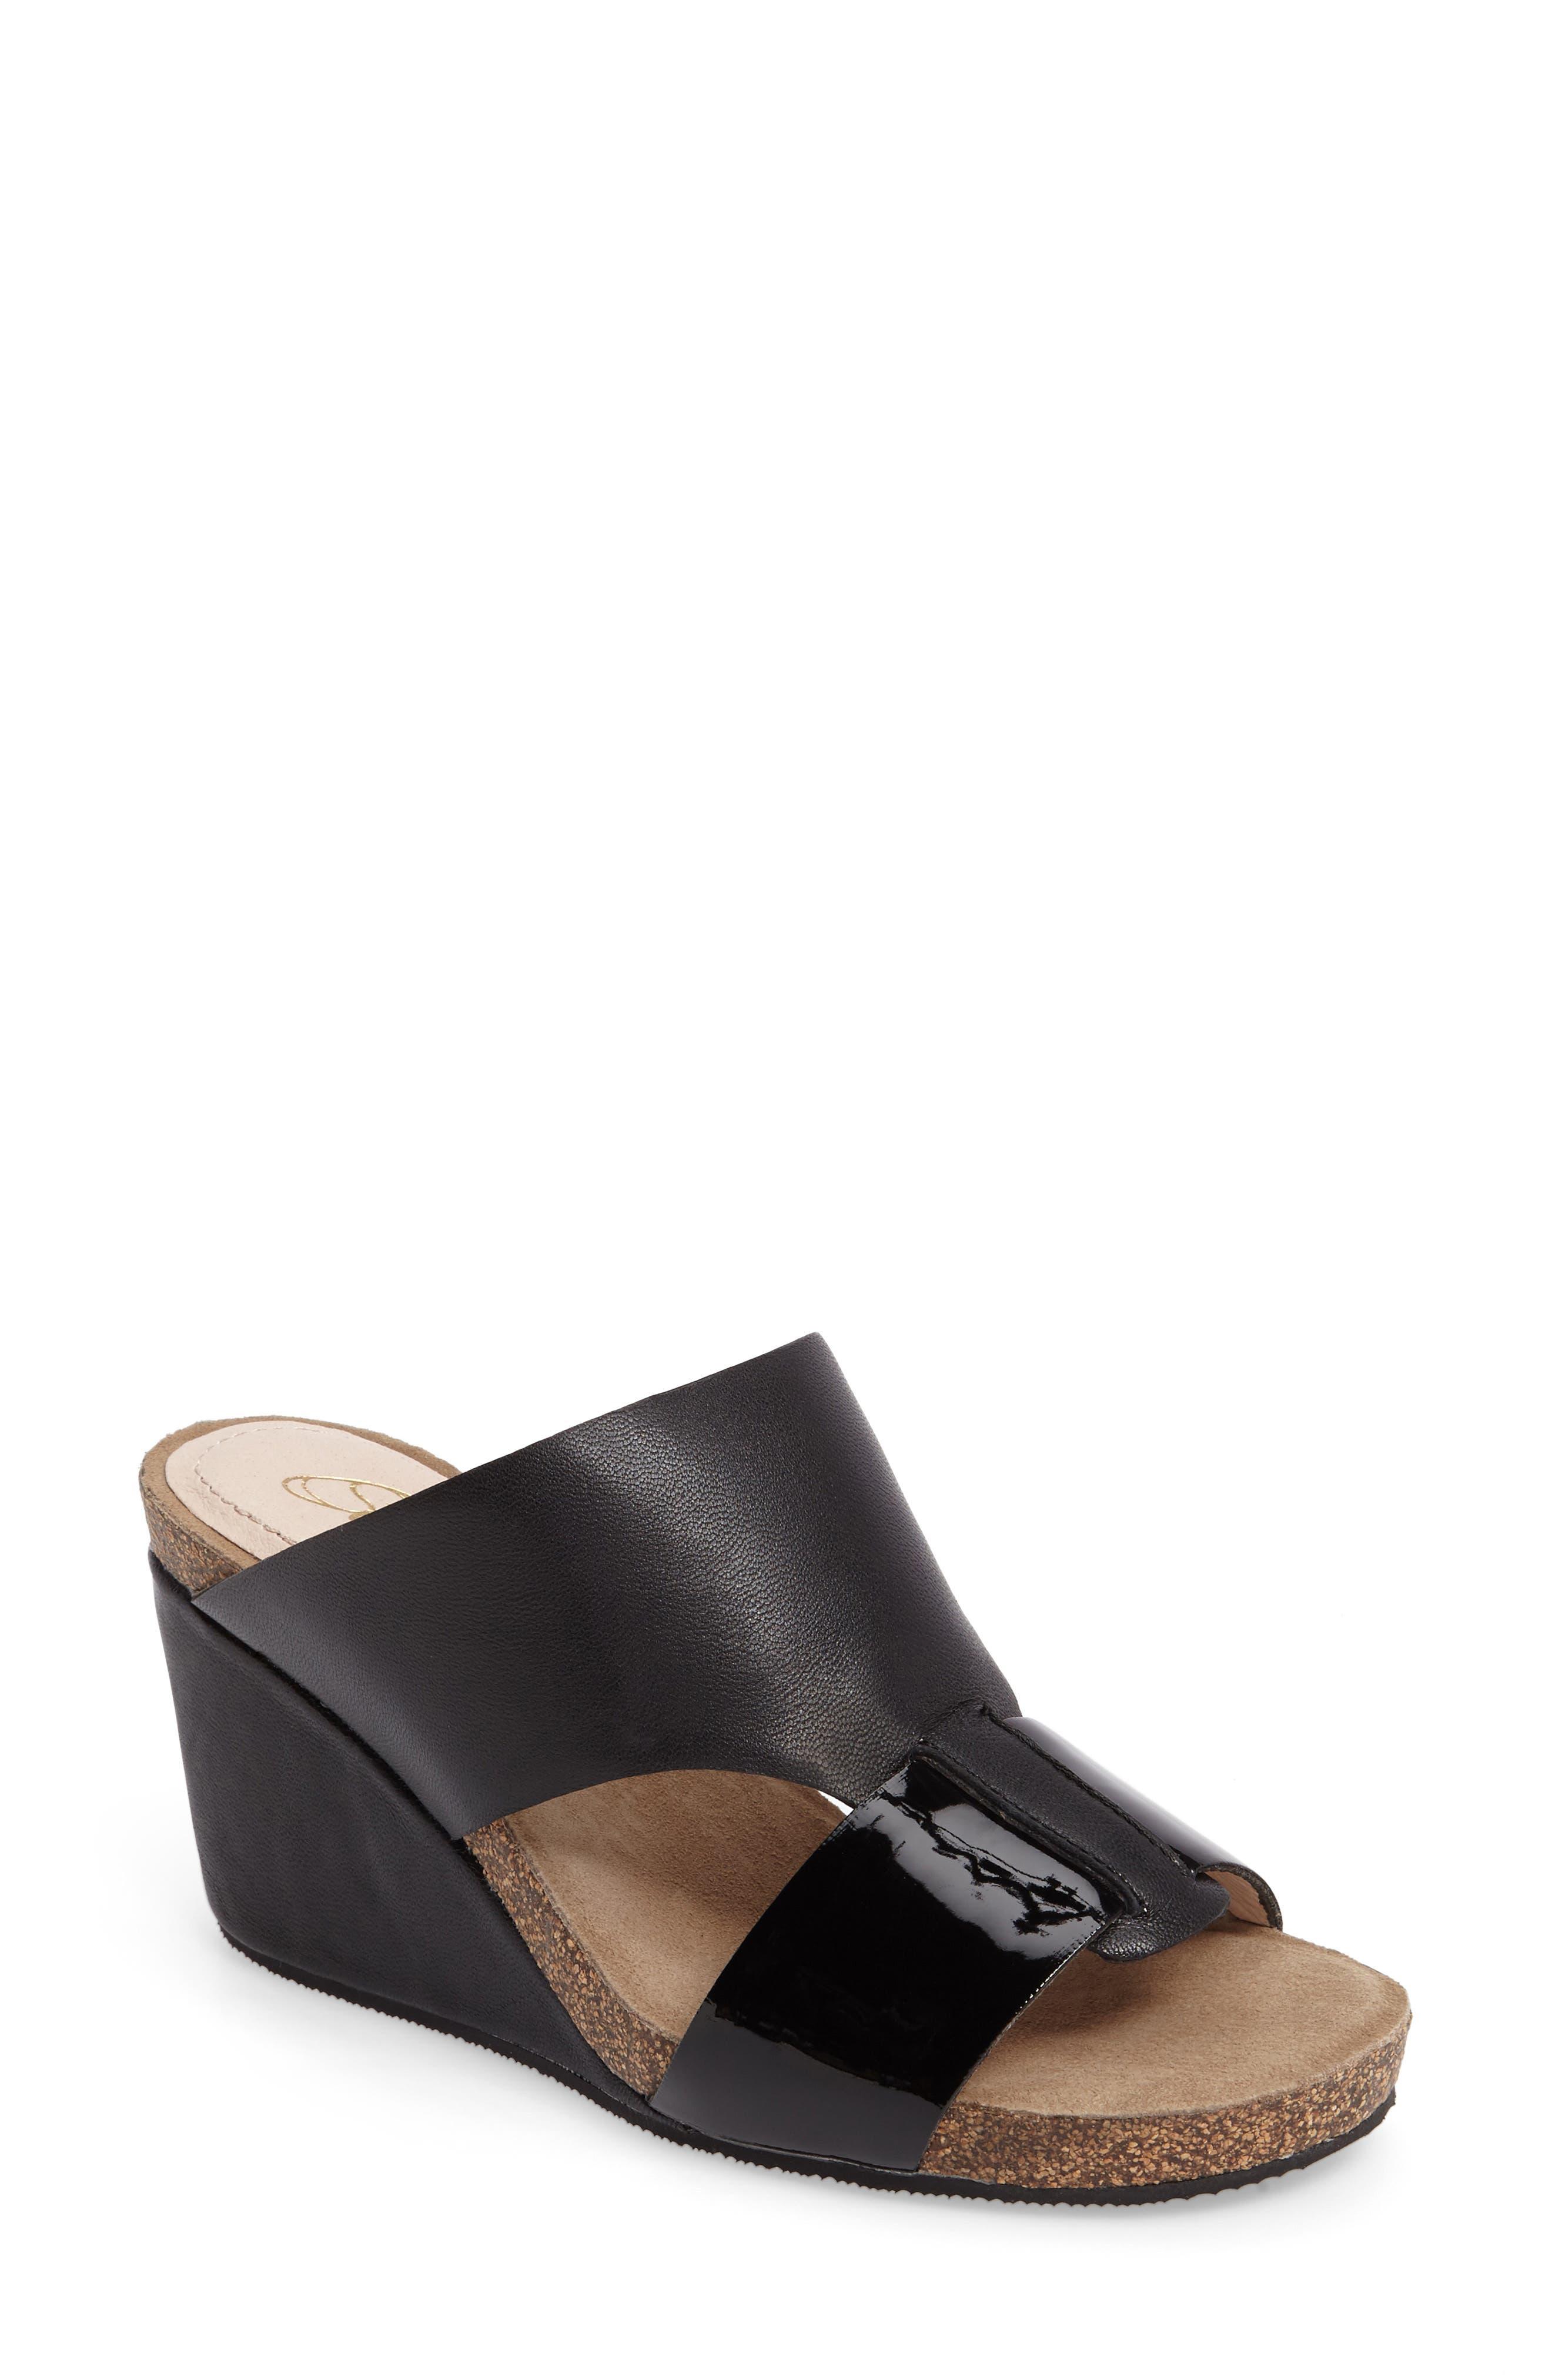 Berta Wedge Sandal,                             Main thumbnail 1, color,                             Black Leather